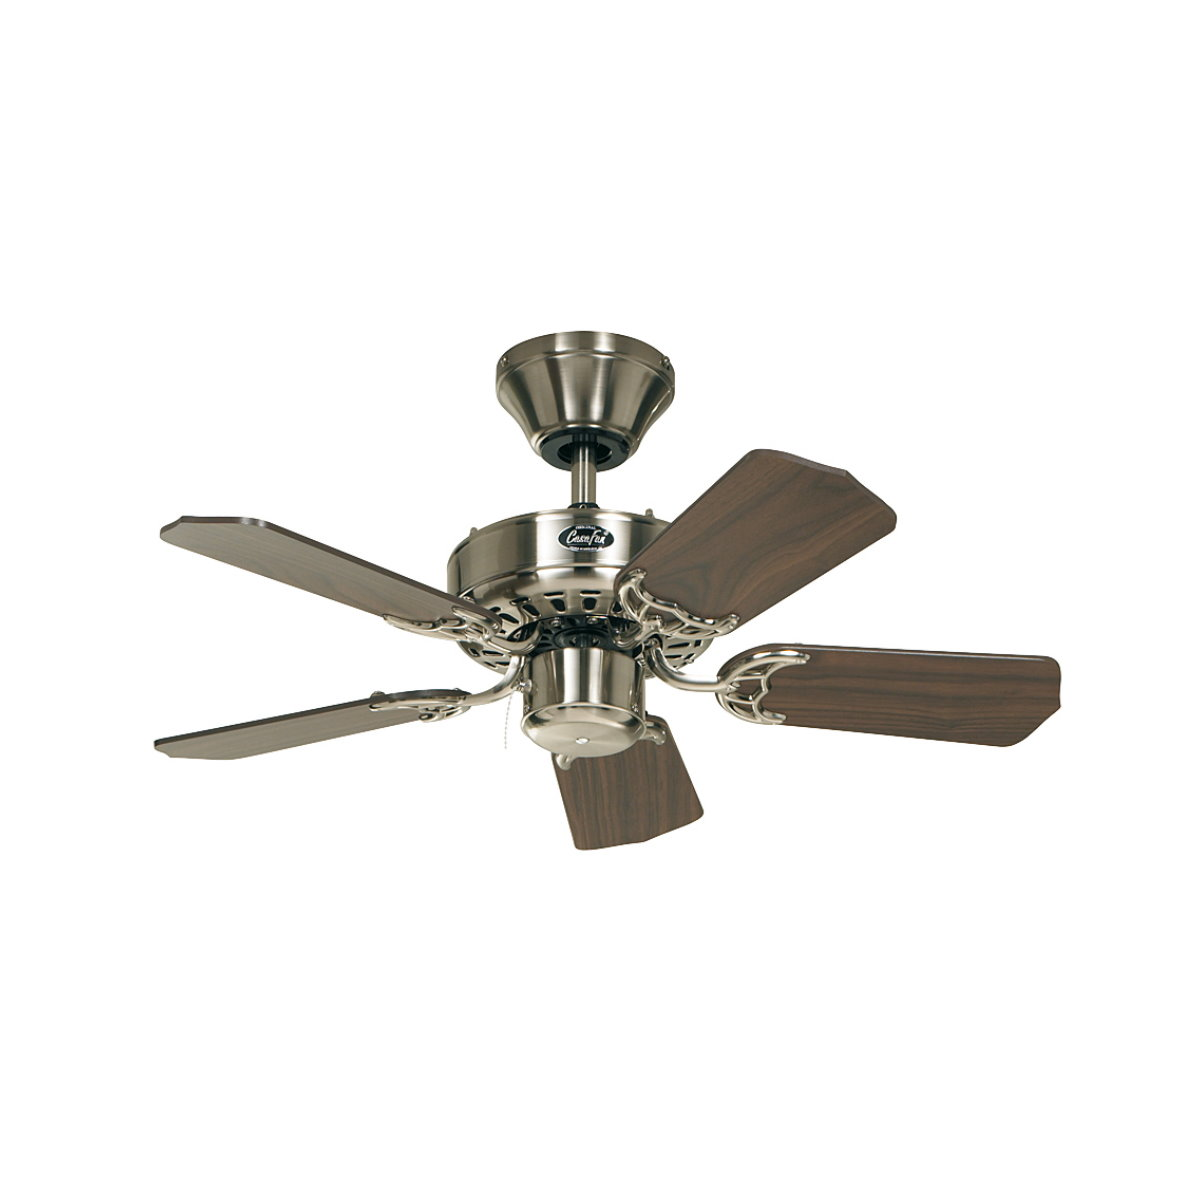 casafan deckenventilator royal classic klassiker decke ventilator ceiling fan ebay. Black Bedroom Furniture Sets. Home Design Ideas